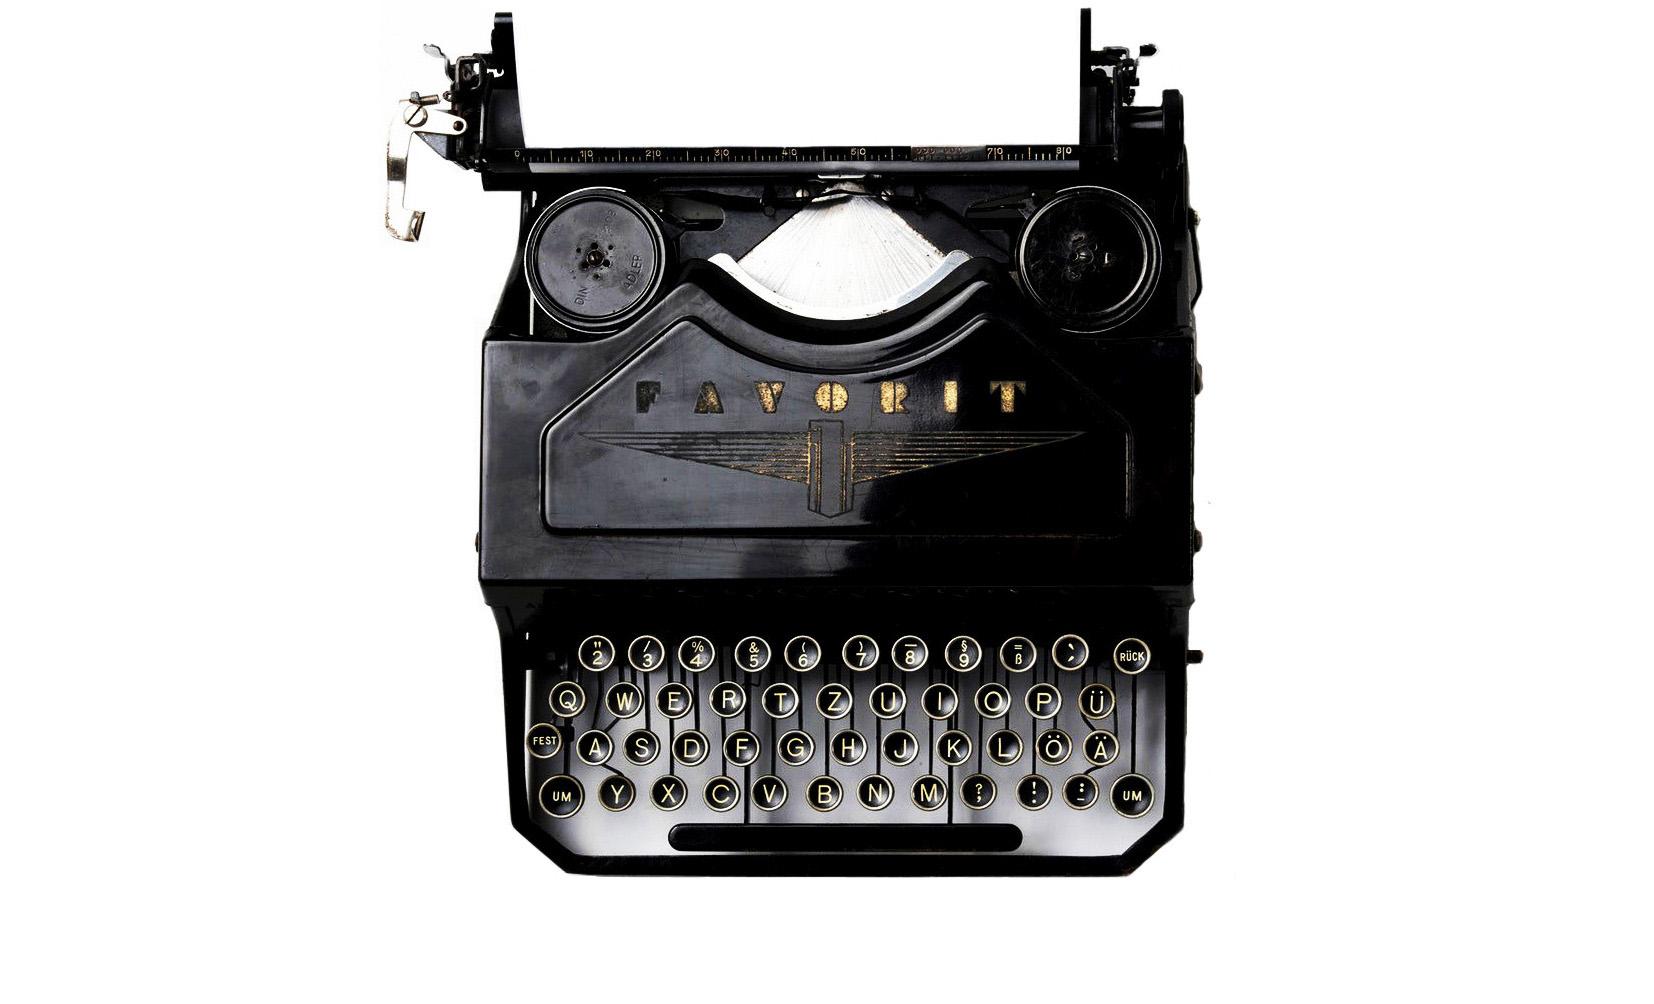 typewriter-kl sw kurz